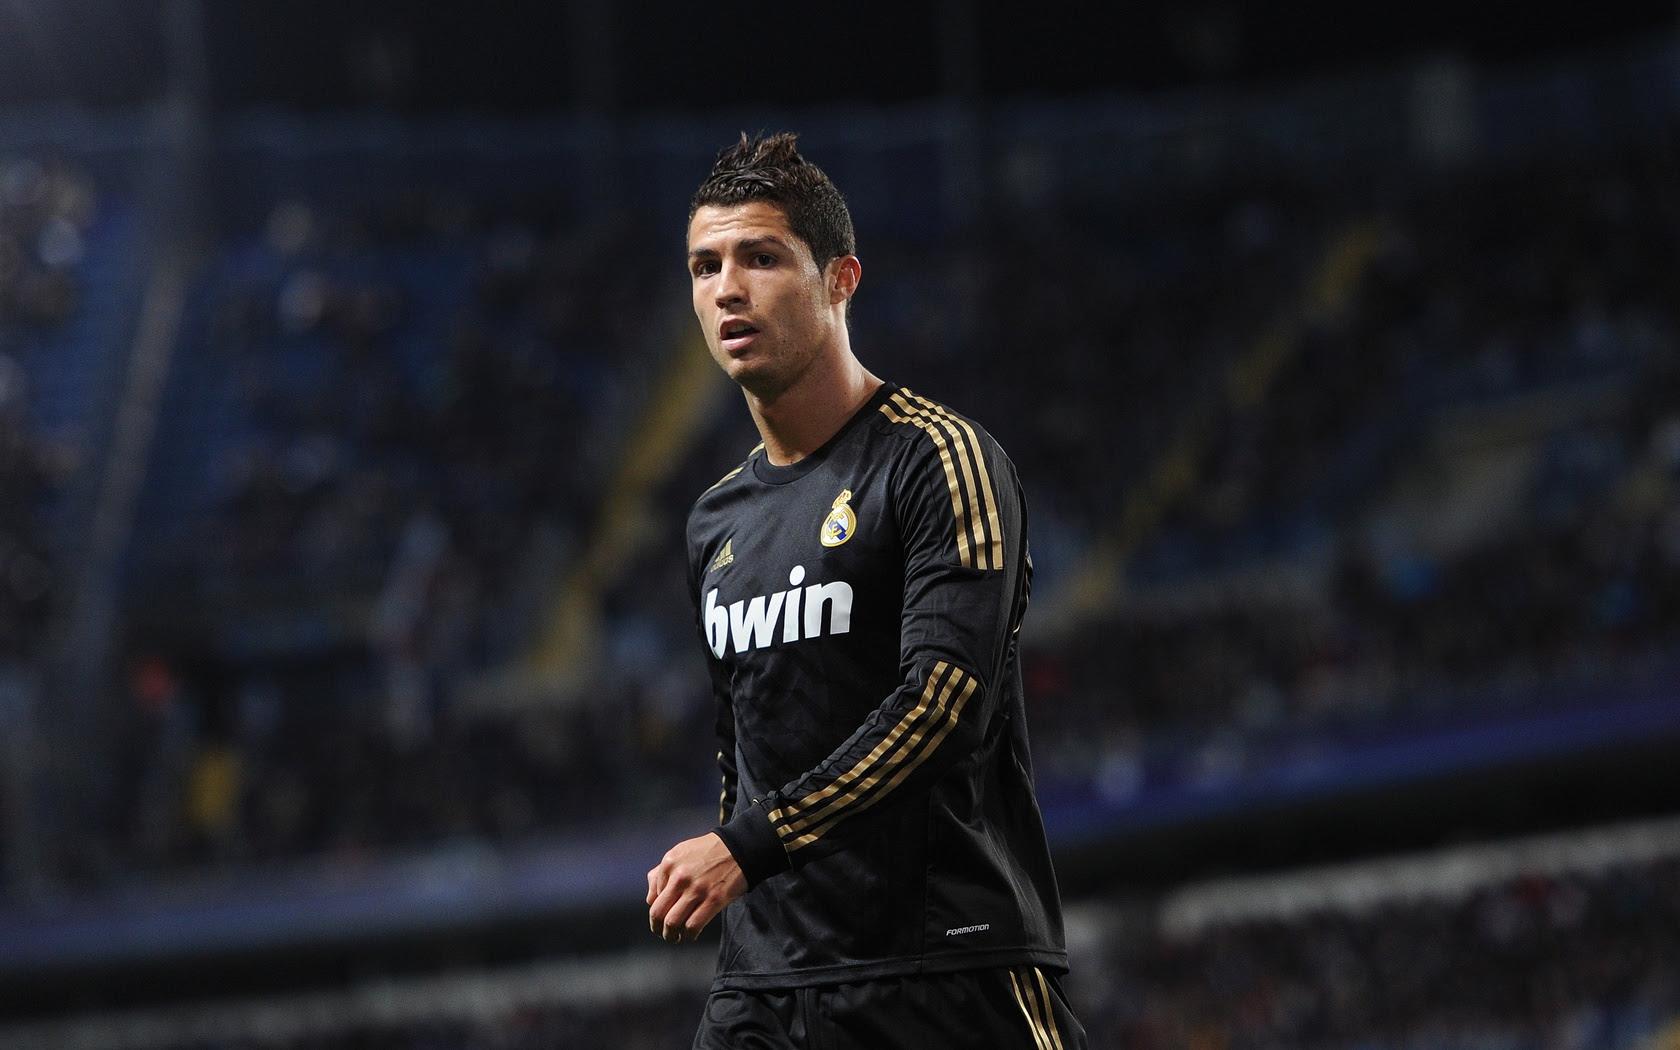 Cristiano Ronaldo Real Madrid Wallpapers 1680x1050 453867